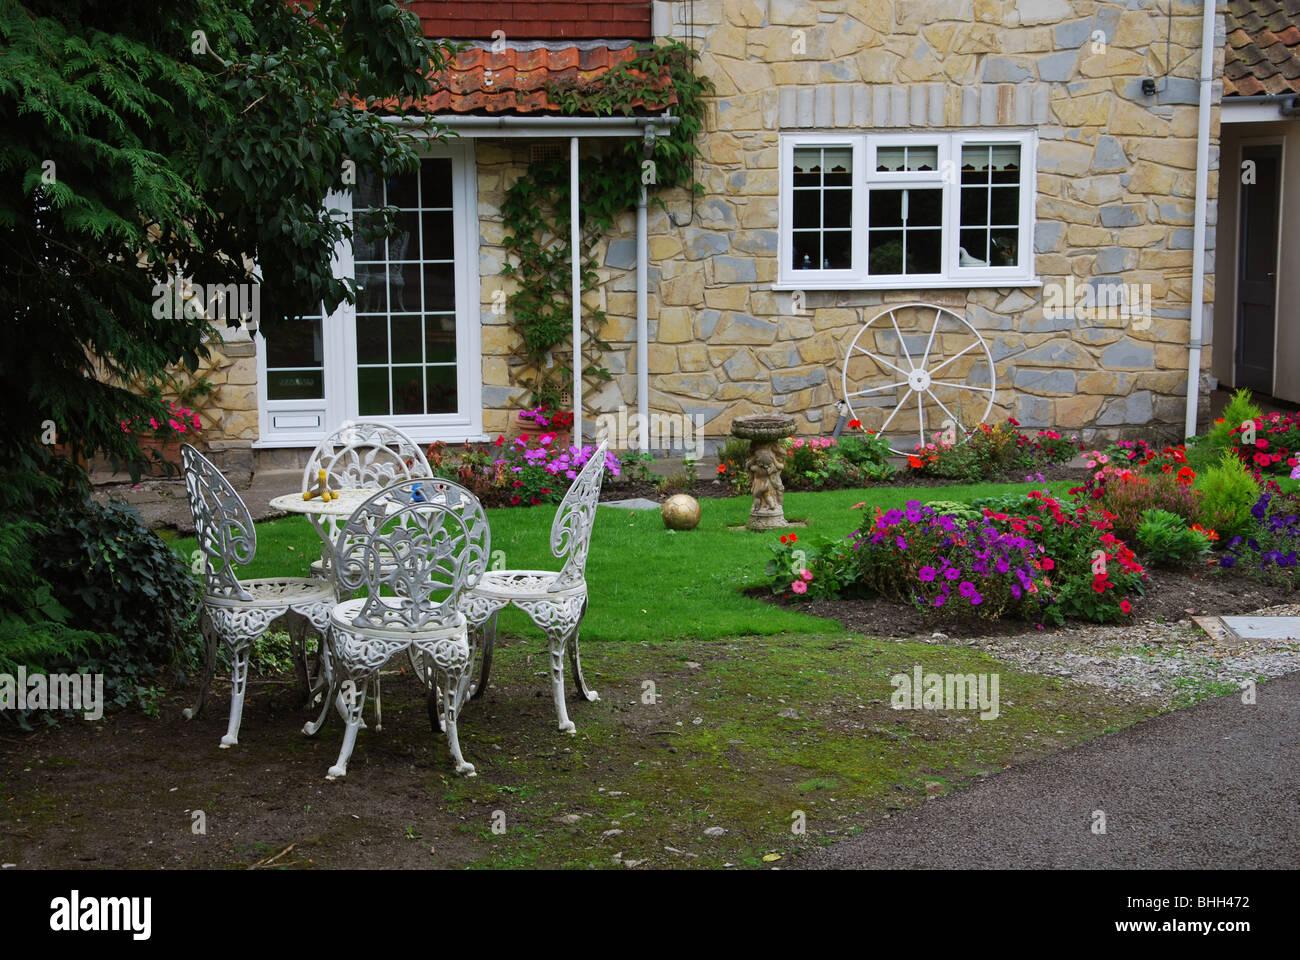 domestic garden Glastonbury United Kingdom - Stock Image